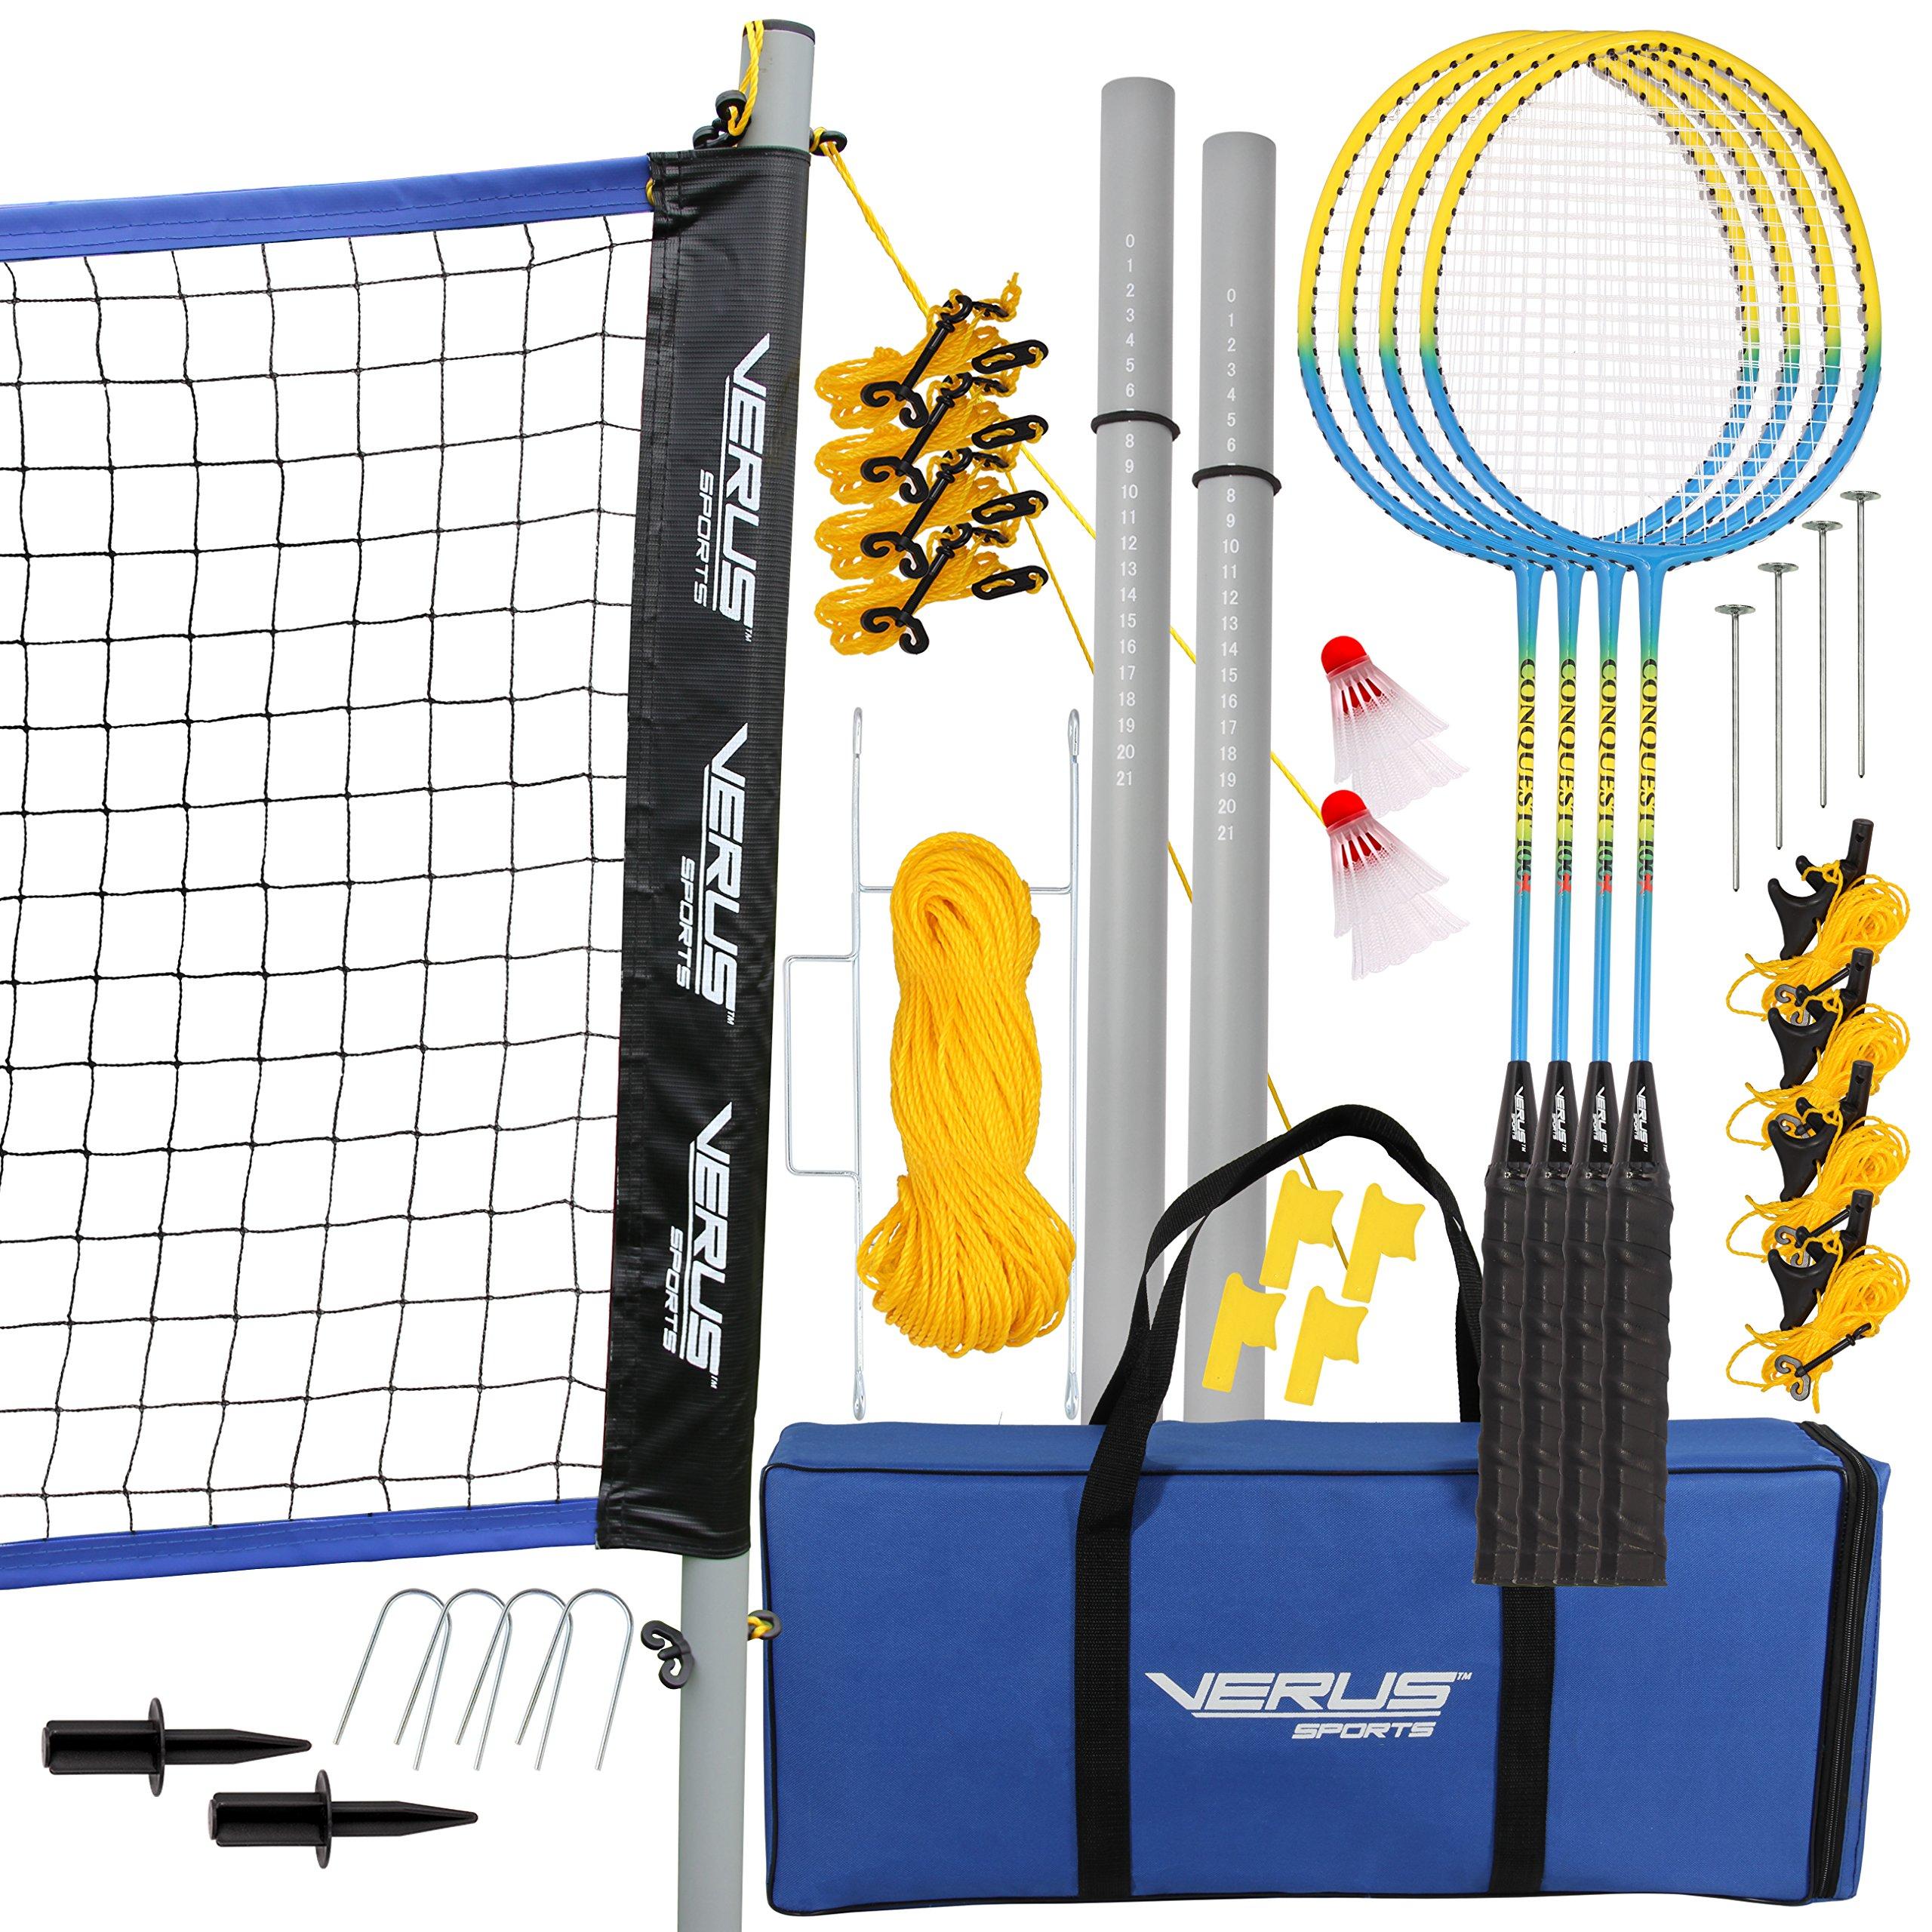 Verus Sports BM700 Expert Badminton Set, Blue